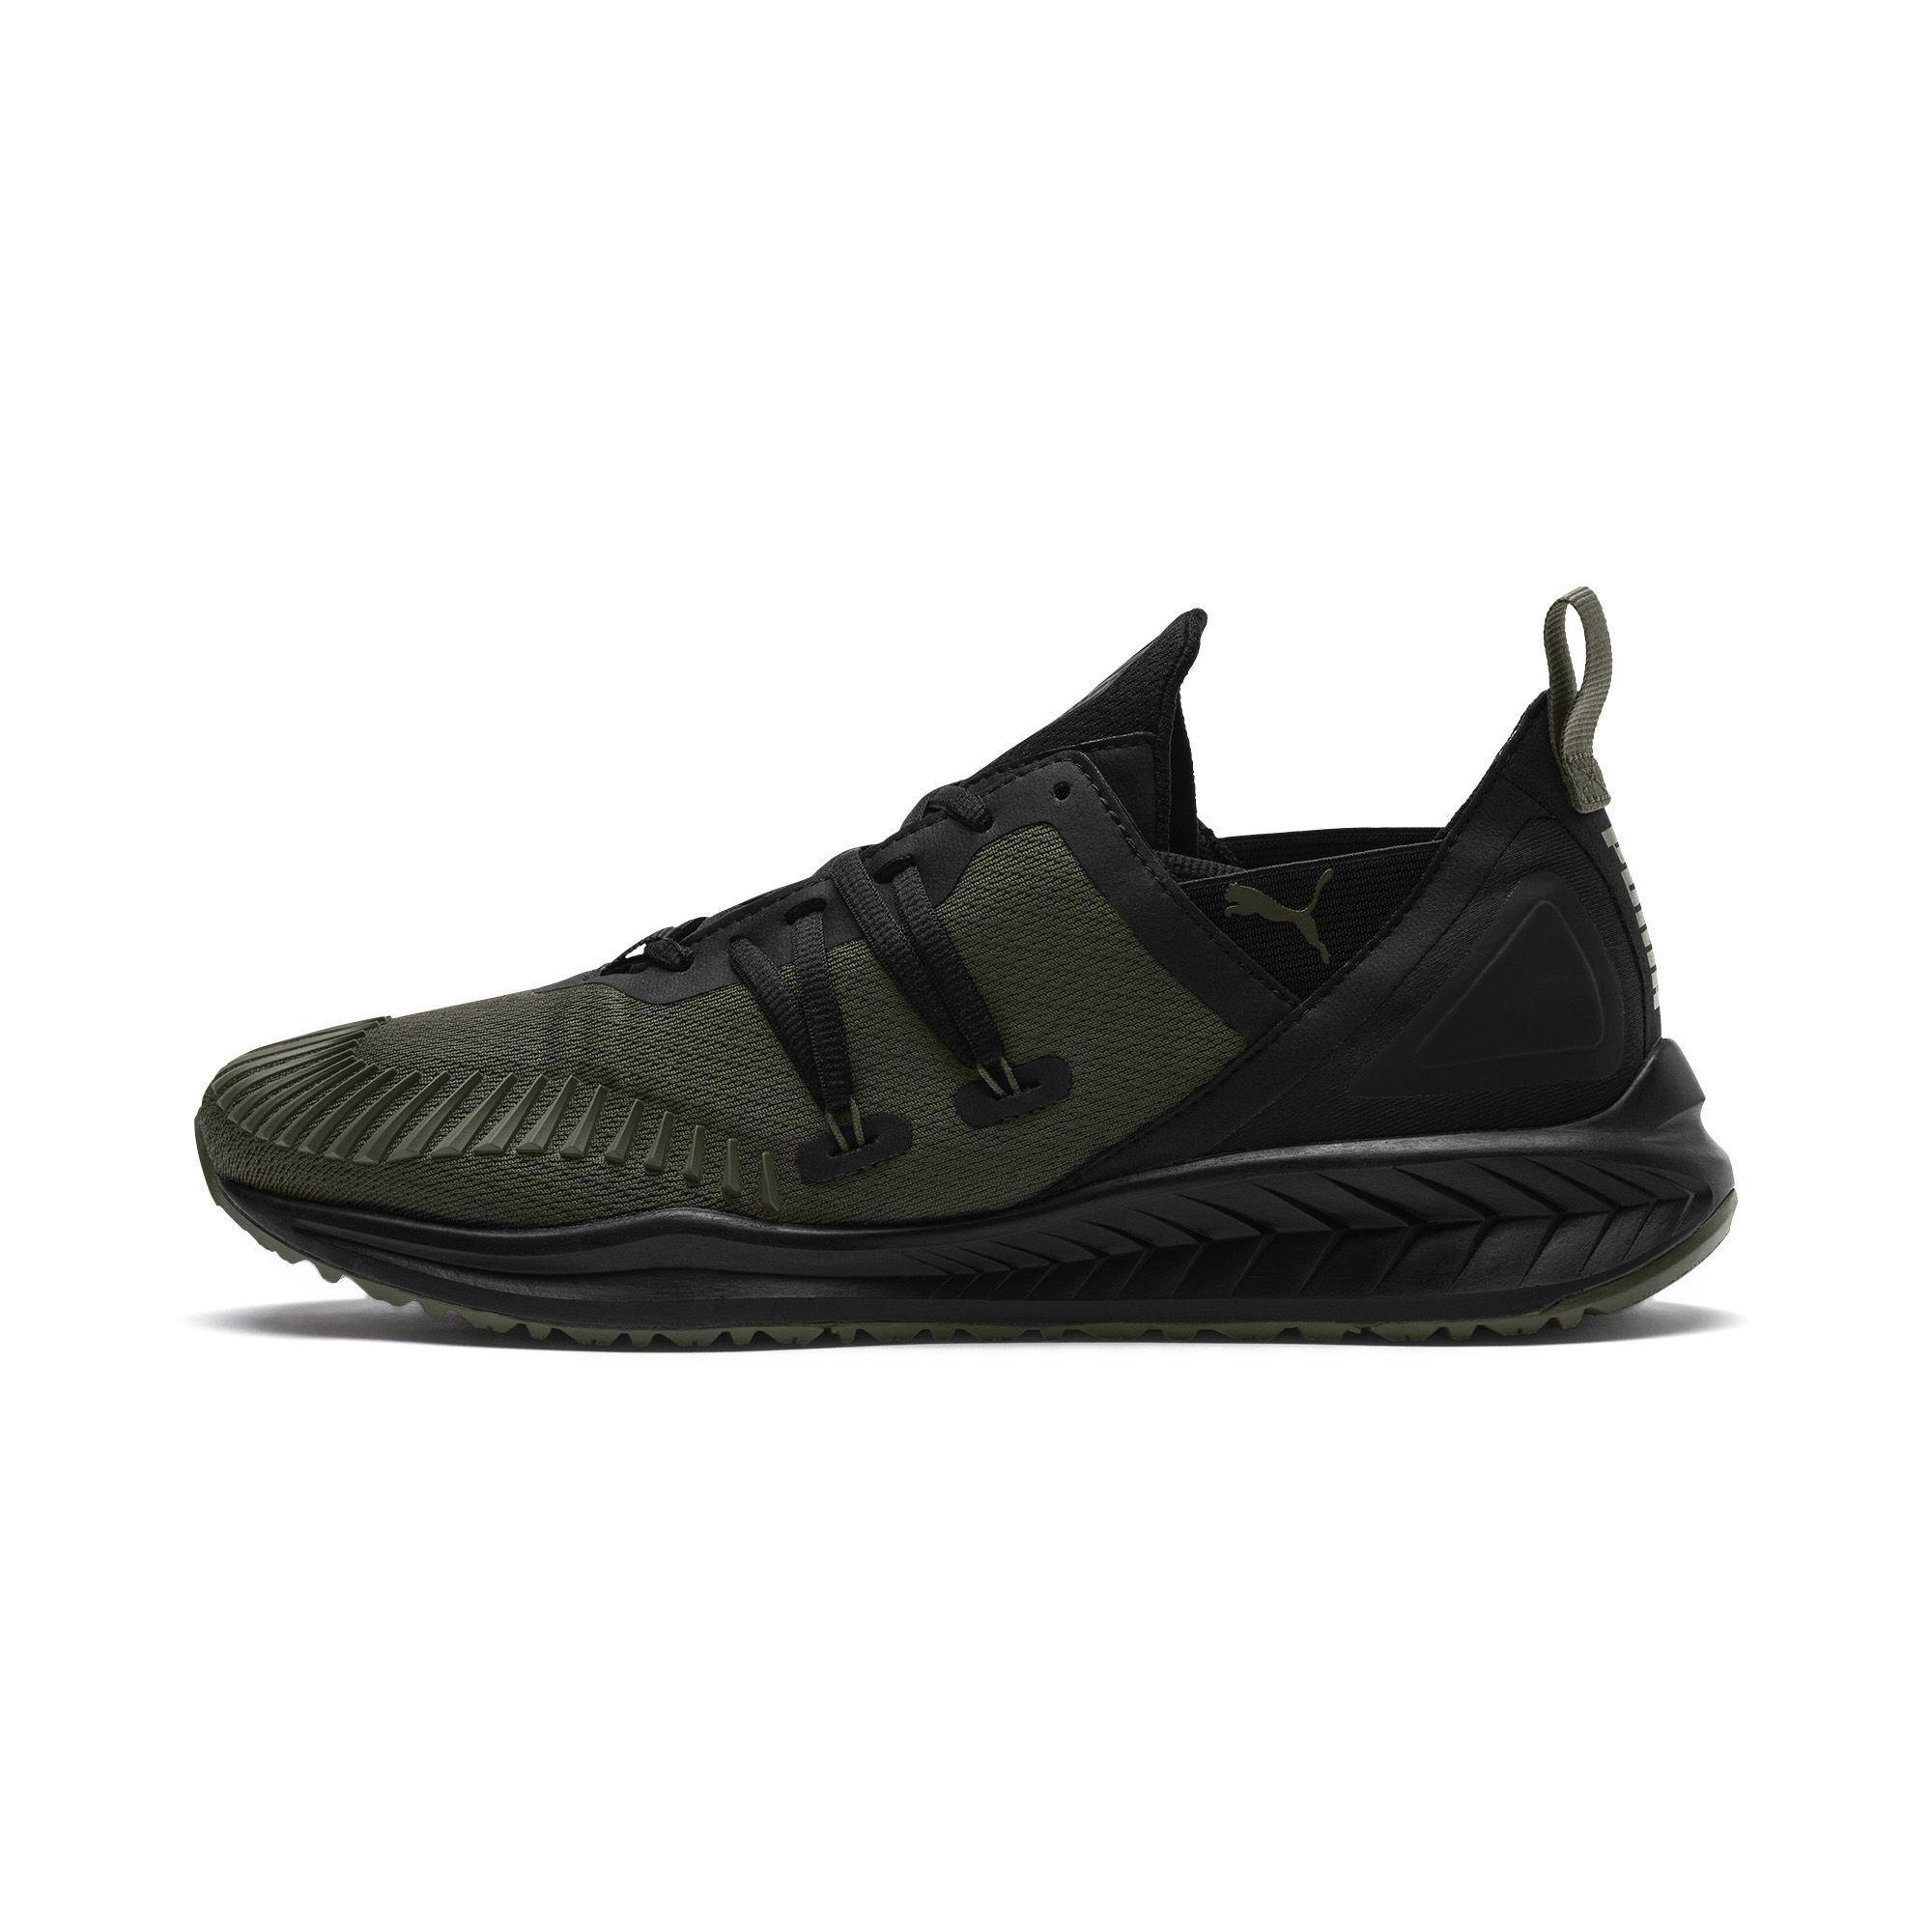 Lyst - PUMA Ignite Ronin Unrest Men s Sneakers in Black for Men d67647e2a